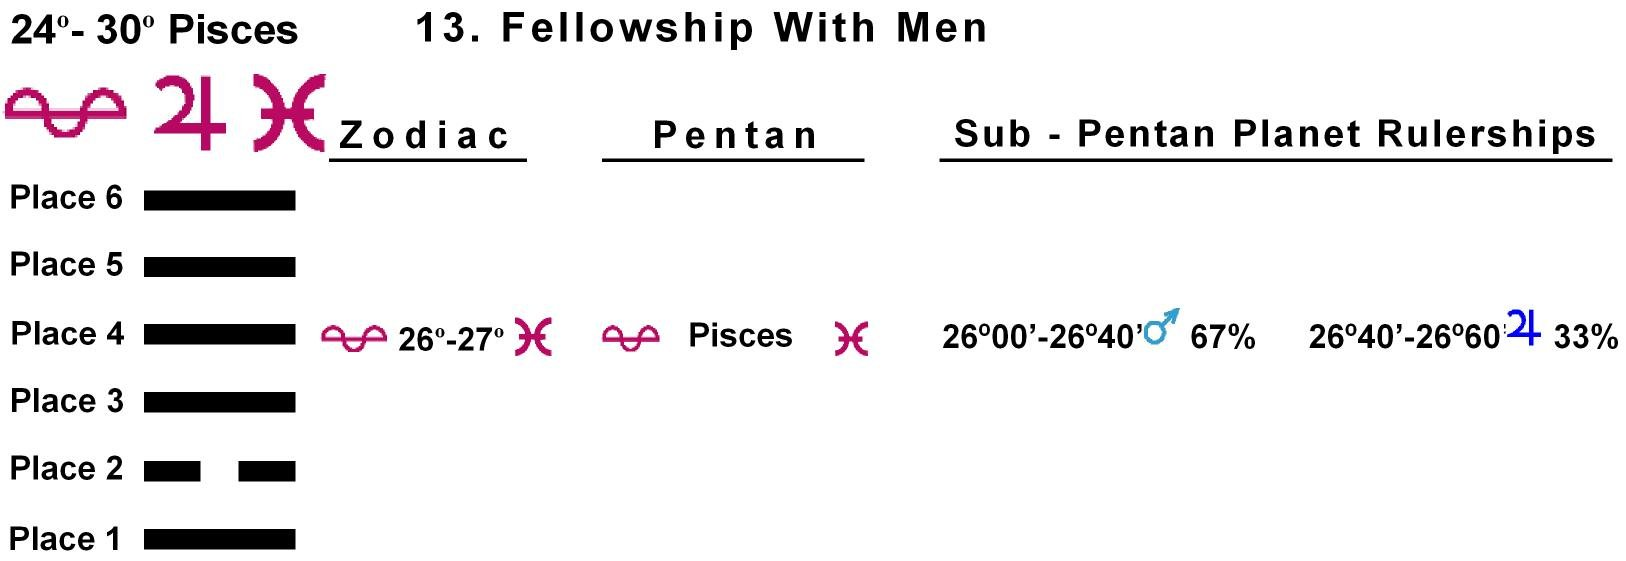 Pent-lines-12PI 26-27 Hx-13 Fellowship With Men